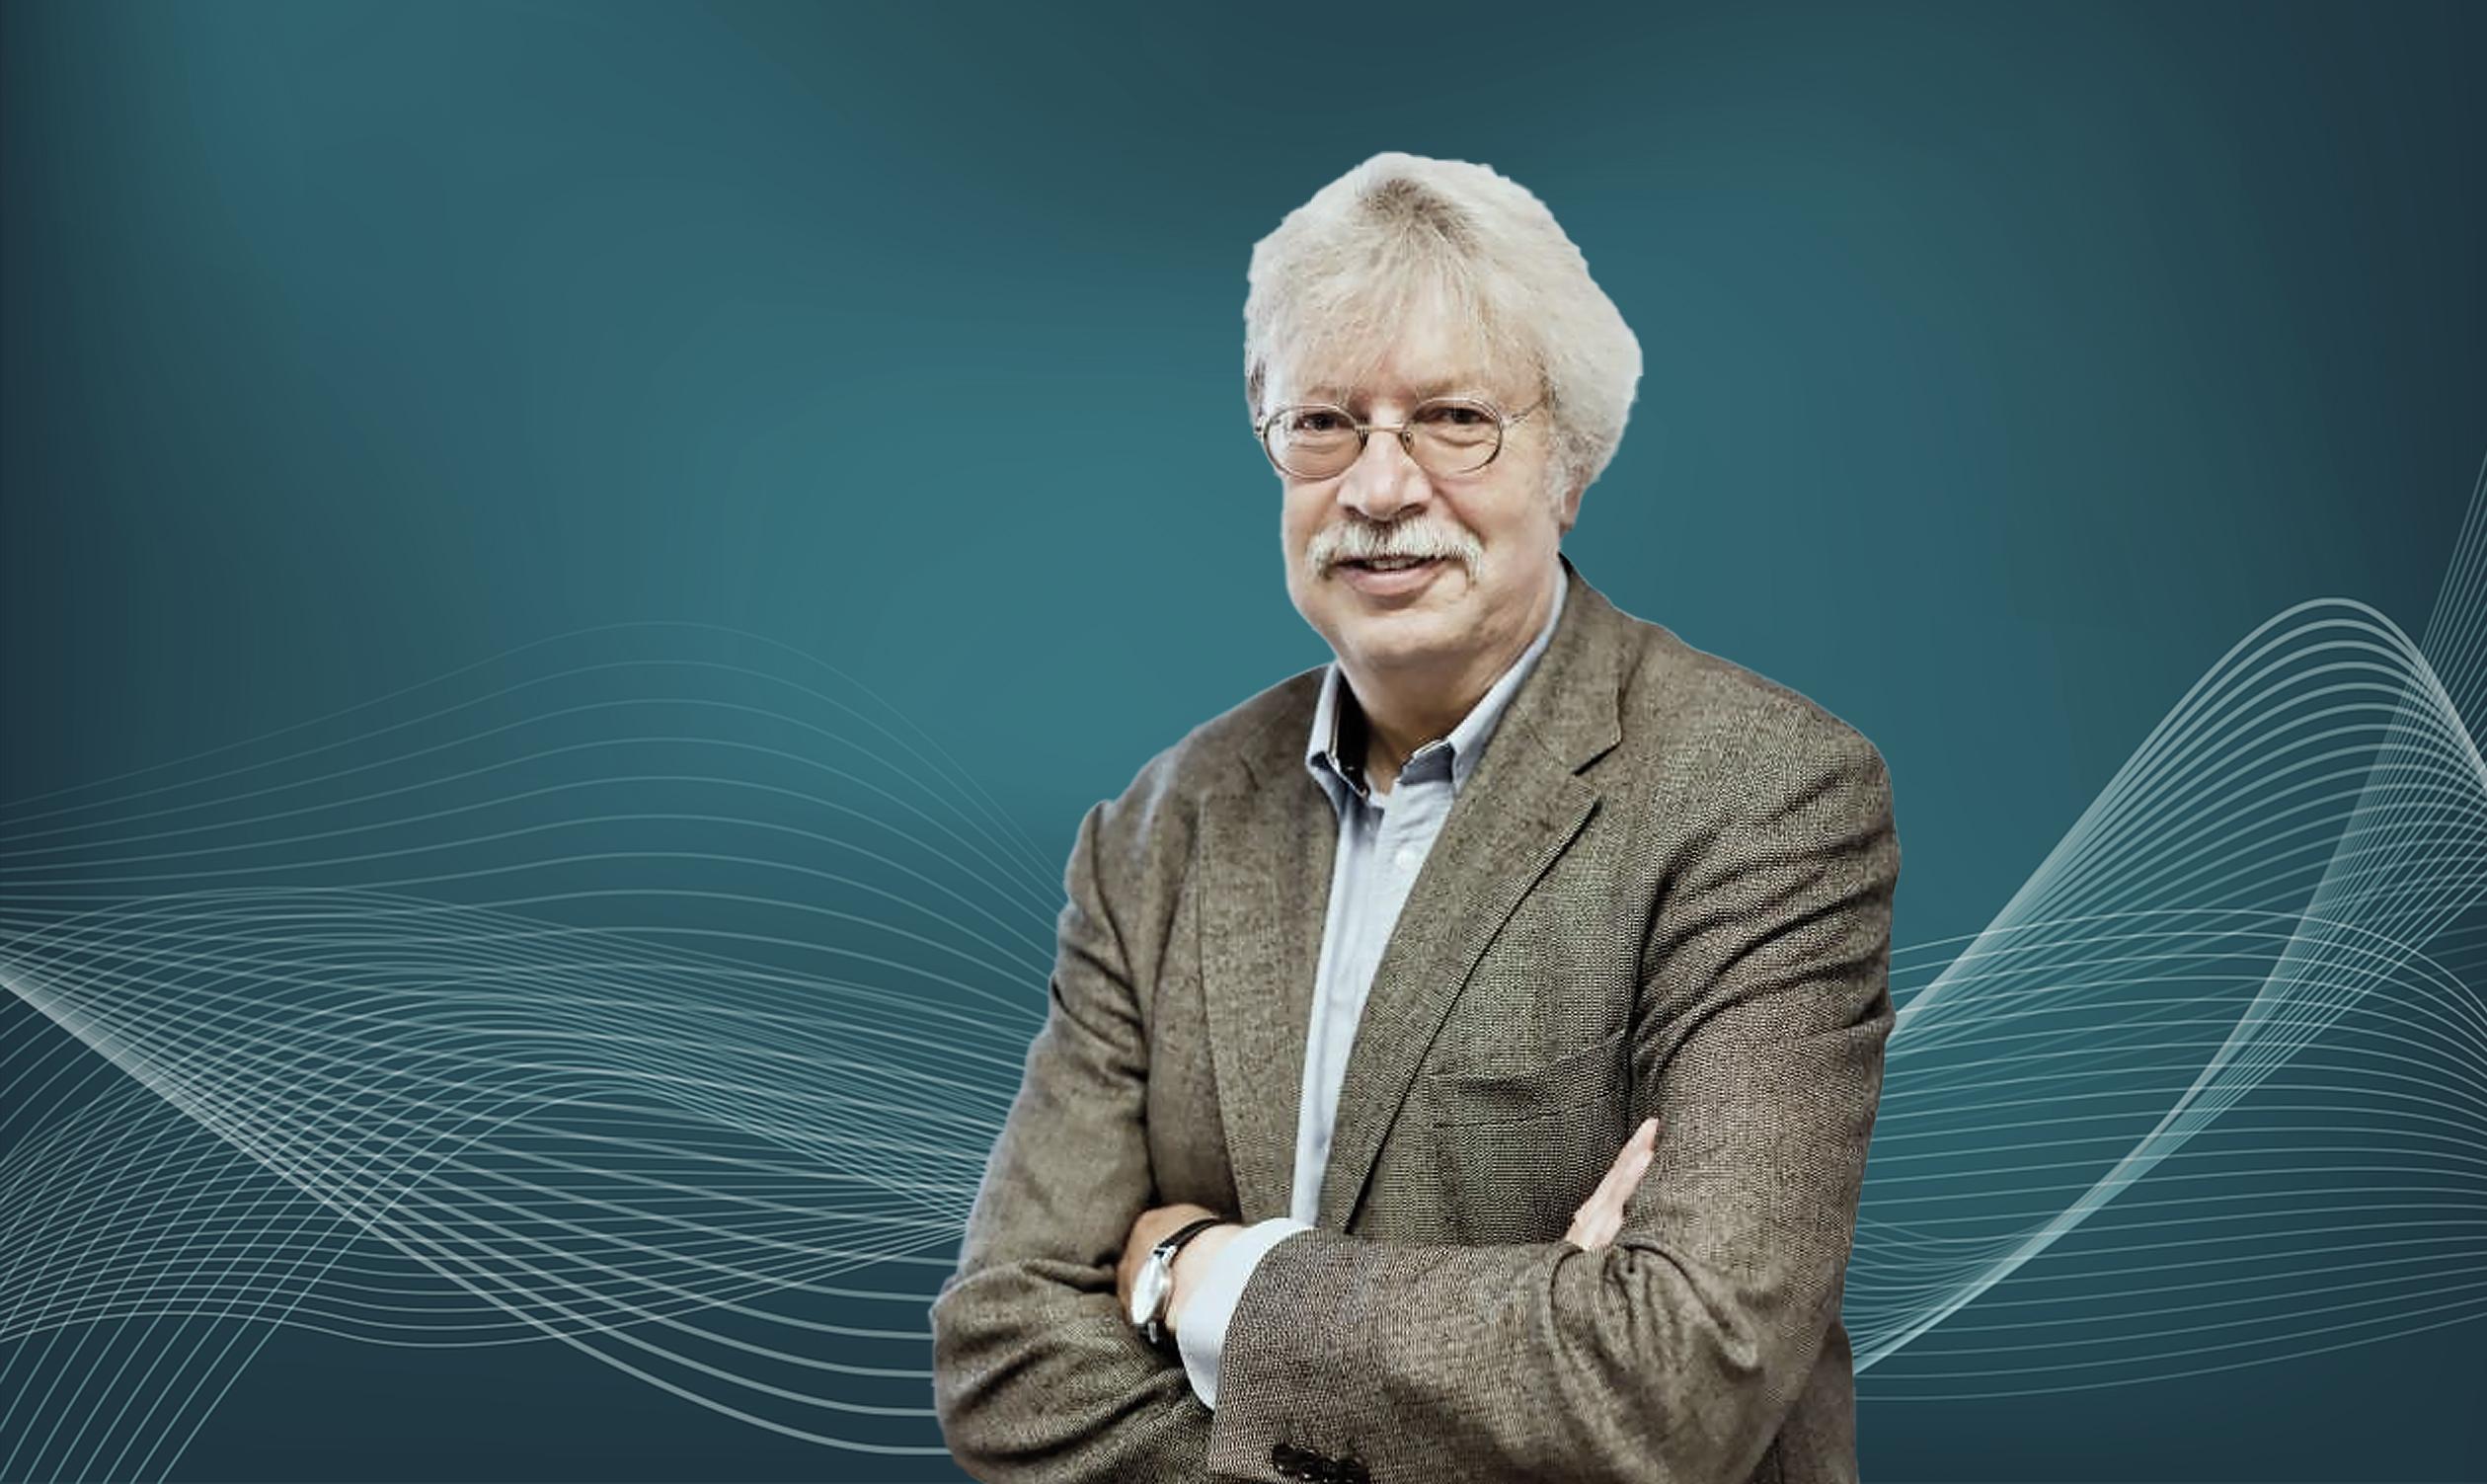 Hans-Albert-Institut begrüßt Andreas Diekmann